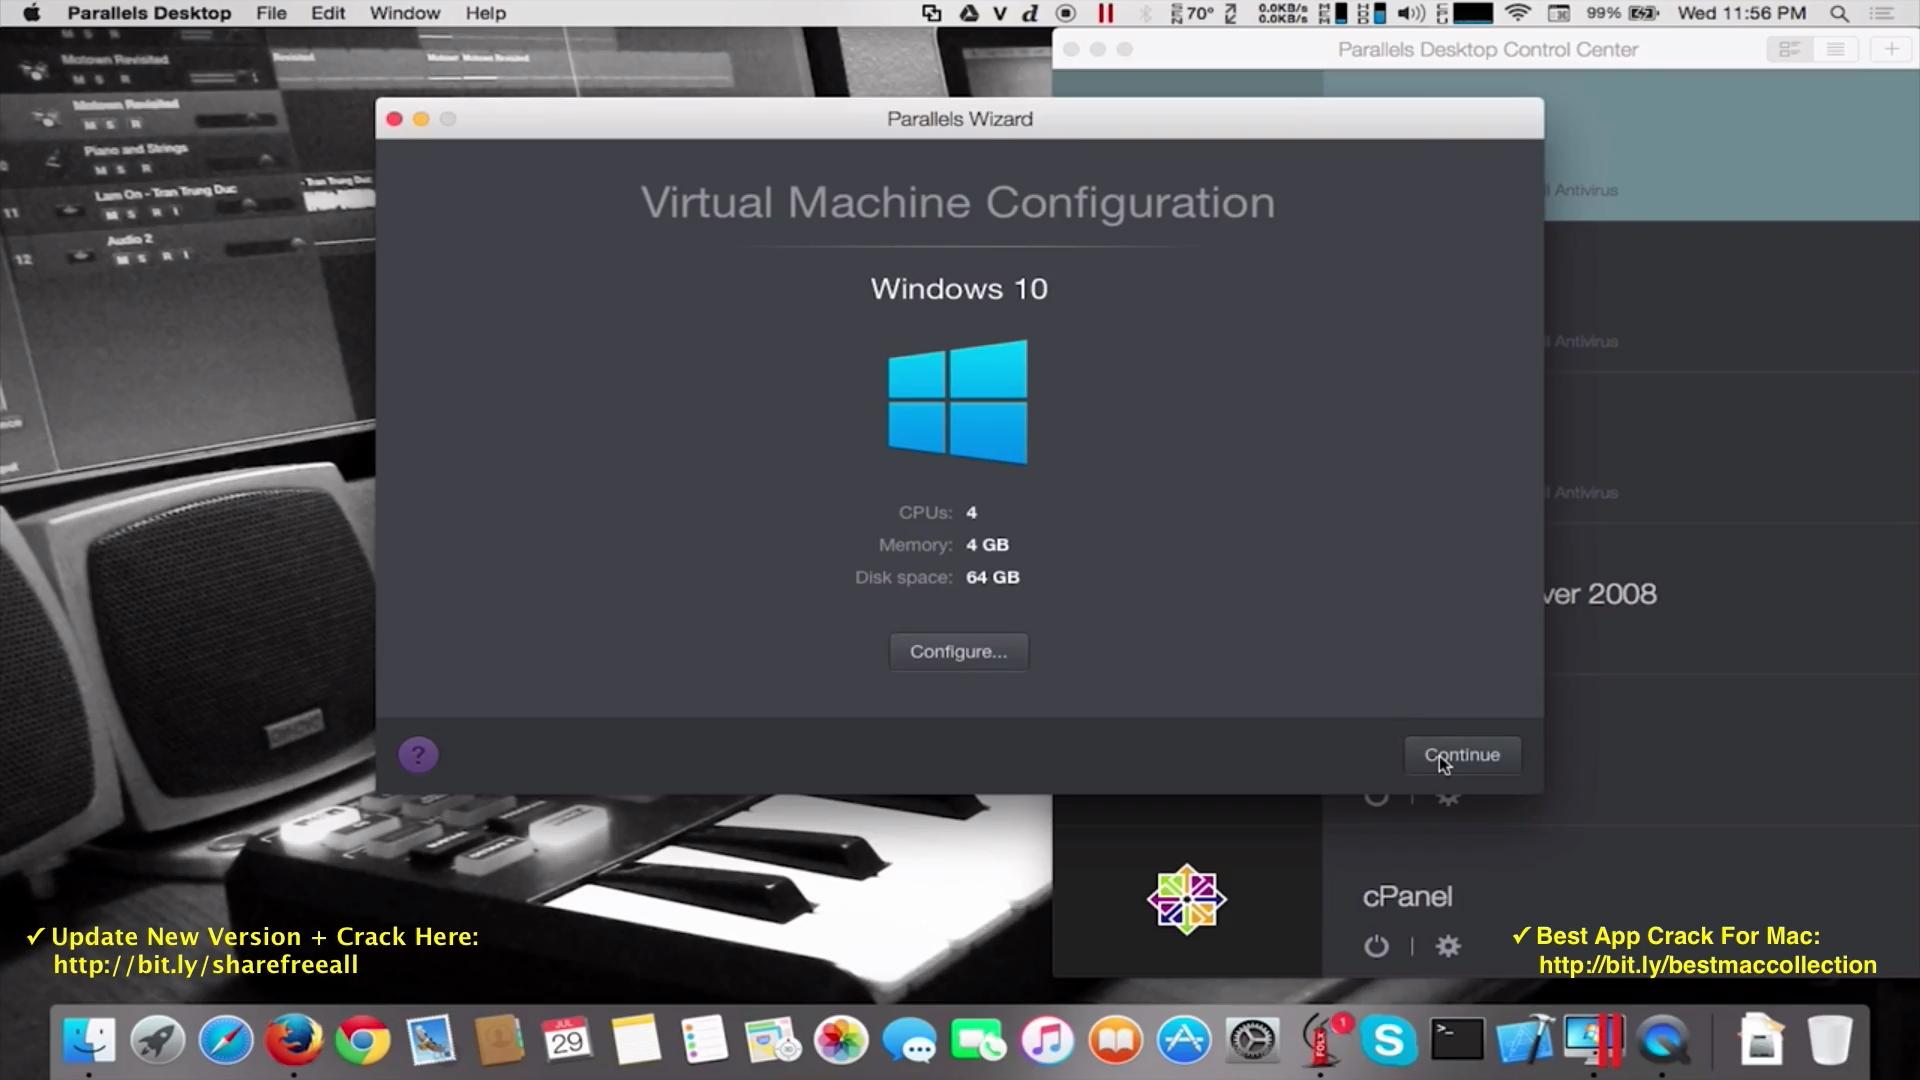 parallels desktop 10 activation key crack